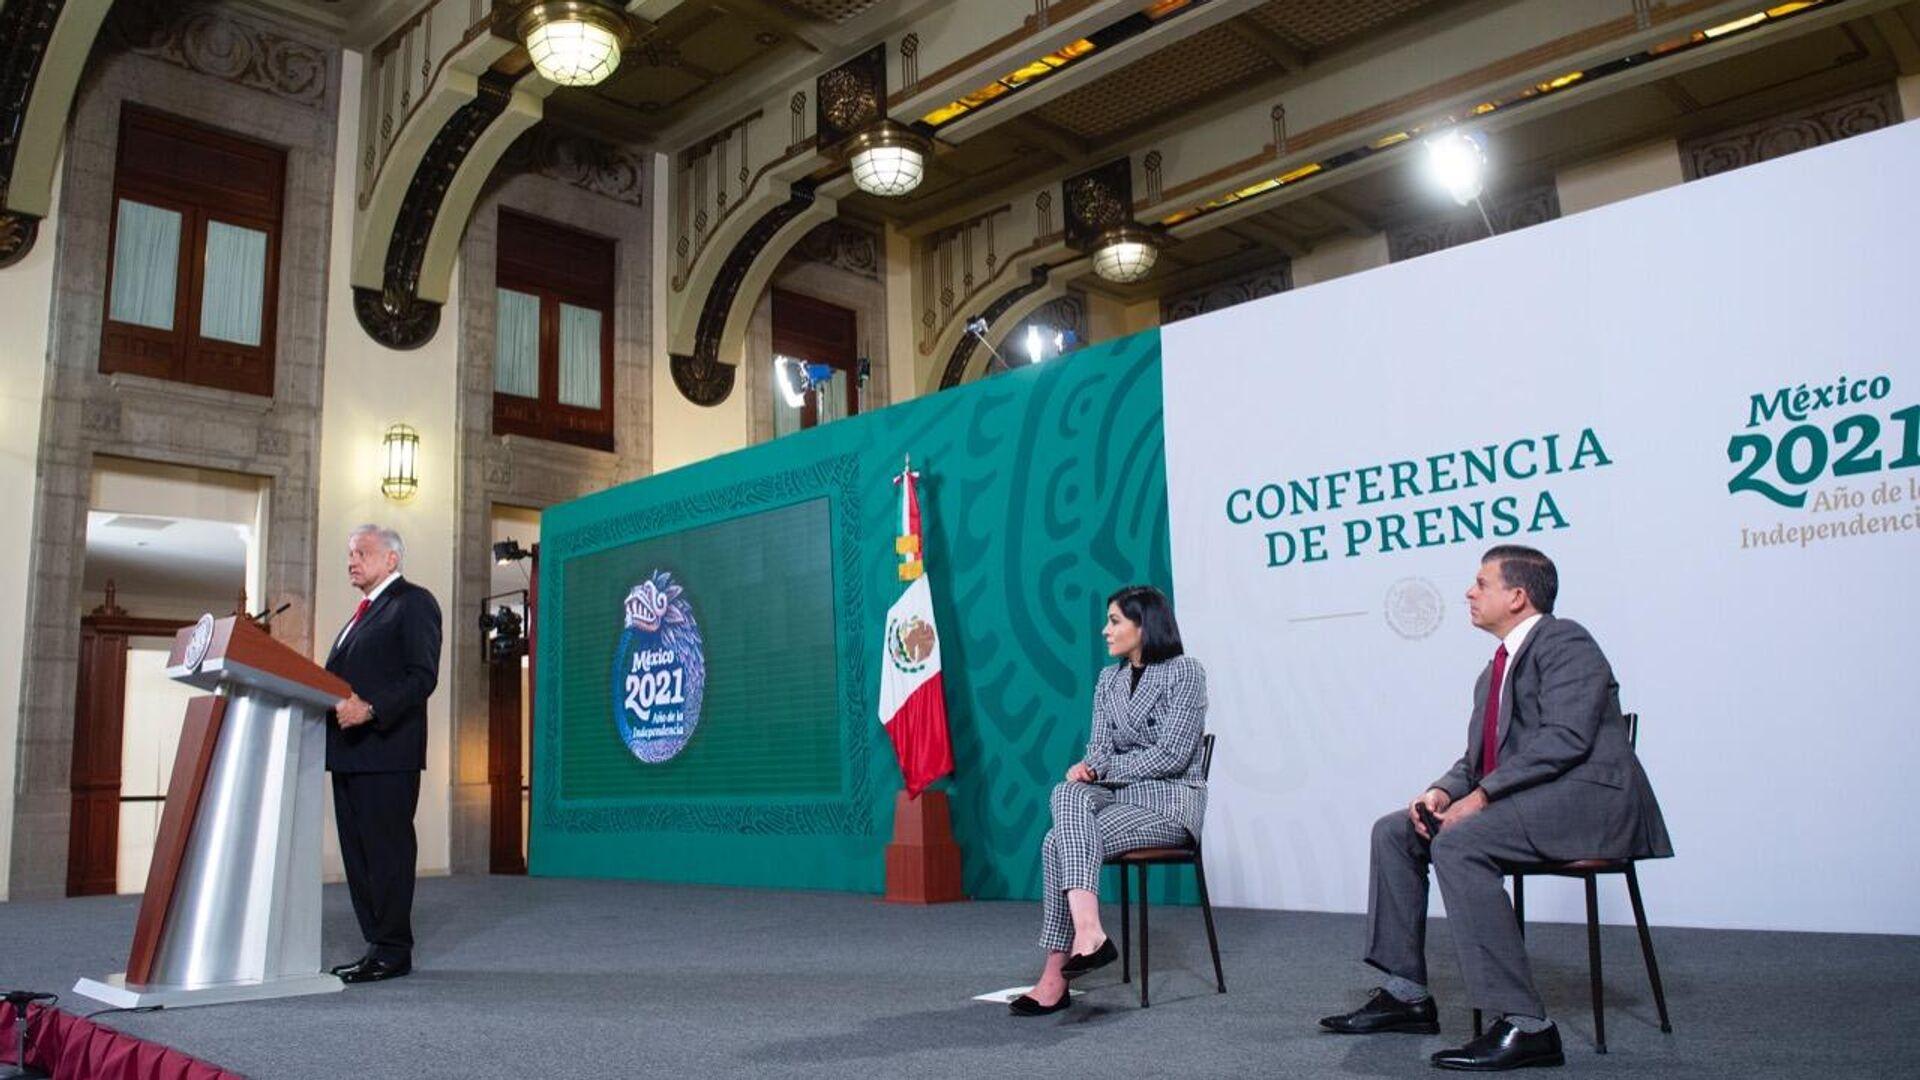 Andrés Manuel López Obrador, Ana García Vilchis y Ricardo Sheffield - Sputnik Mundo, 1920, 29.09.2021